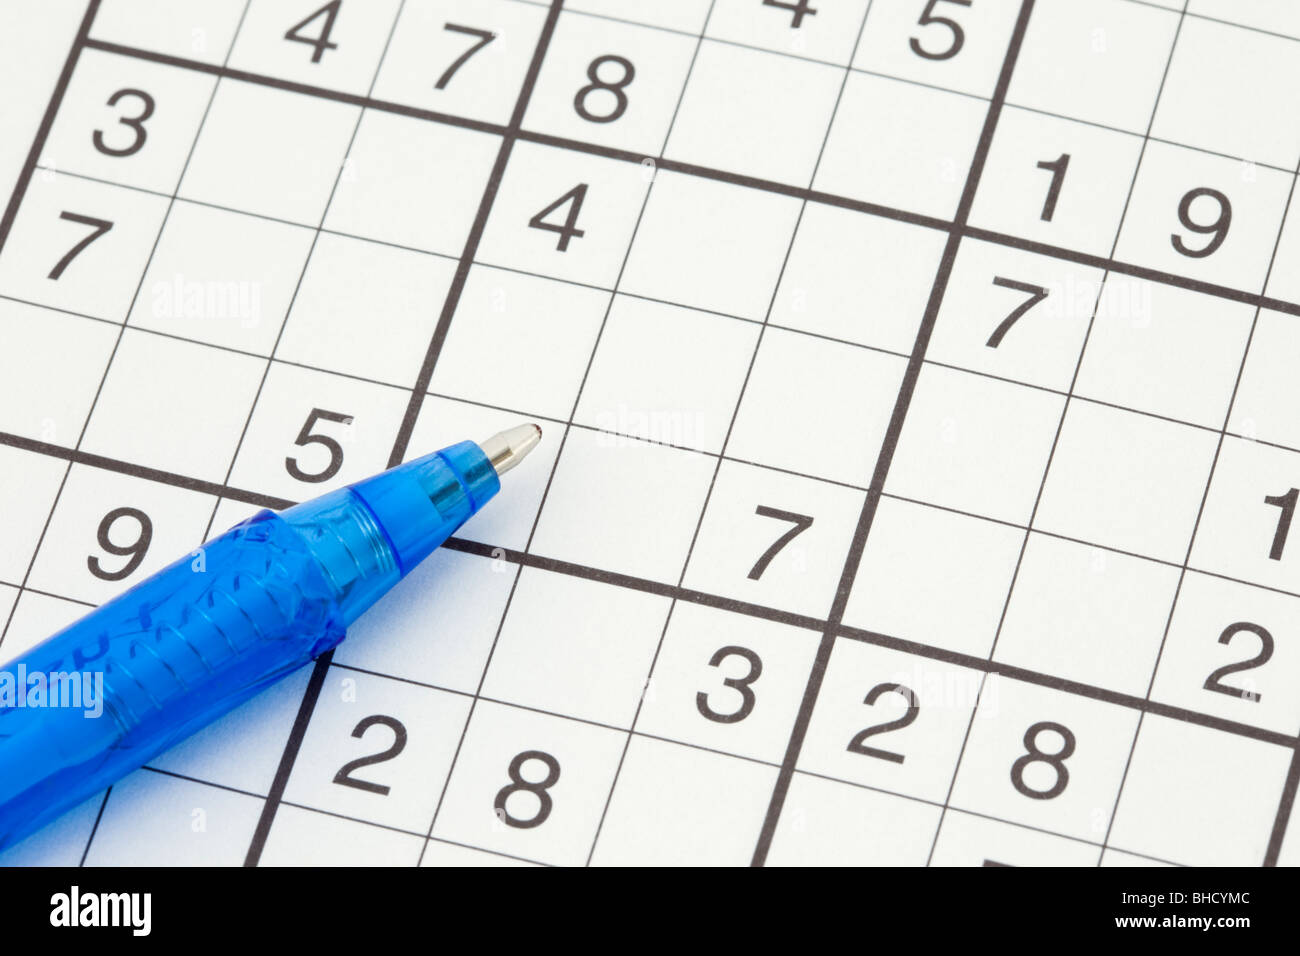 Suduko jeu de chiffres et un stylo close-up Photo Stock